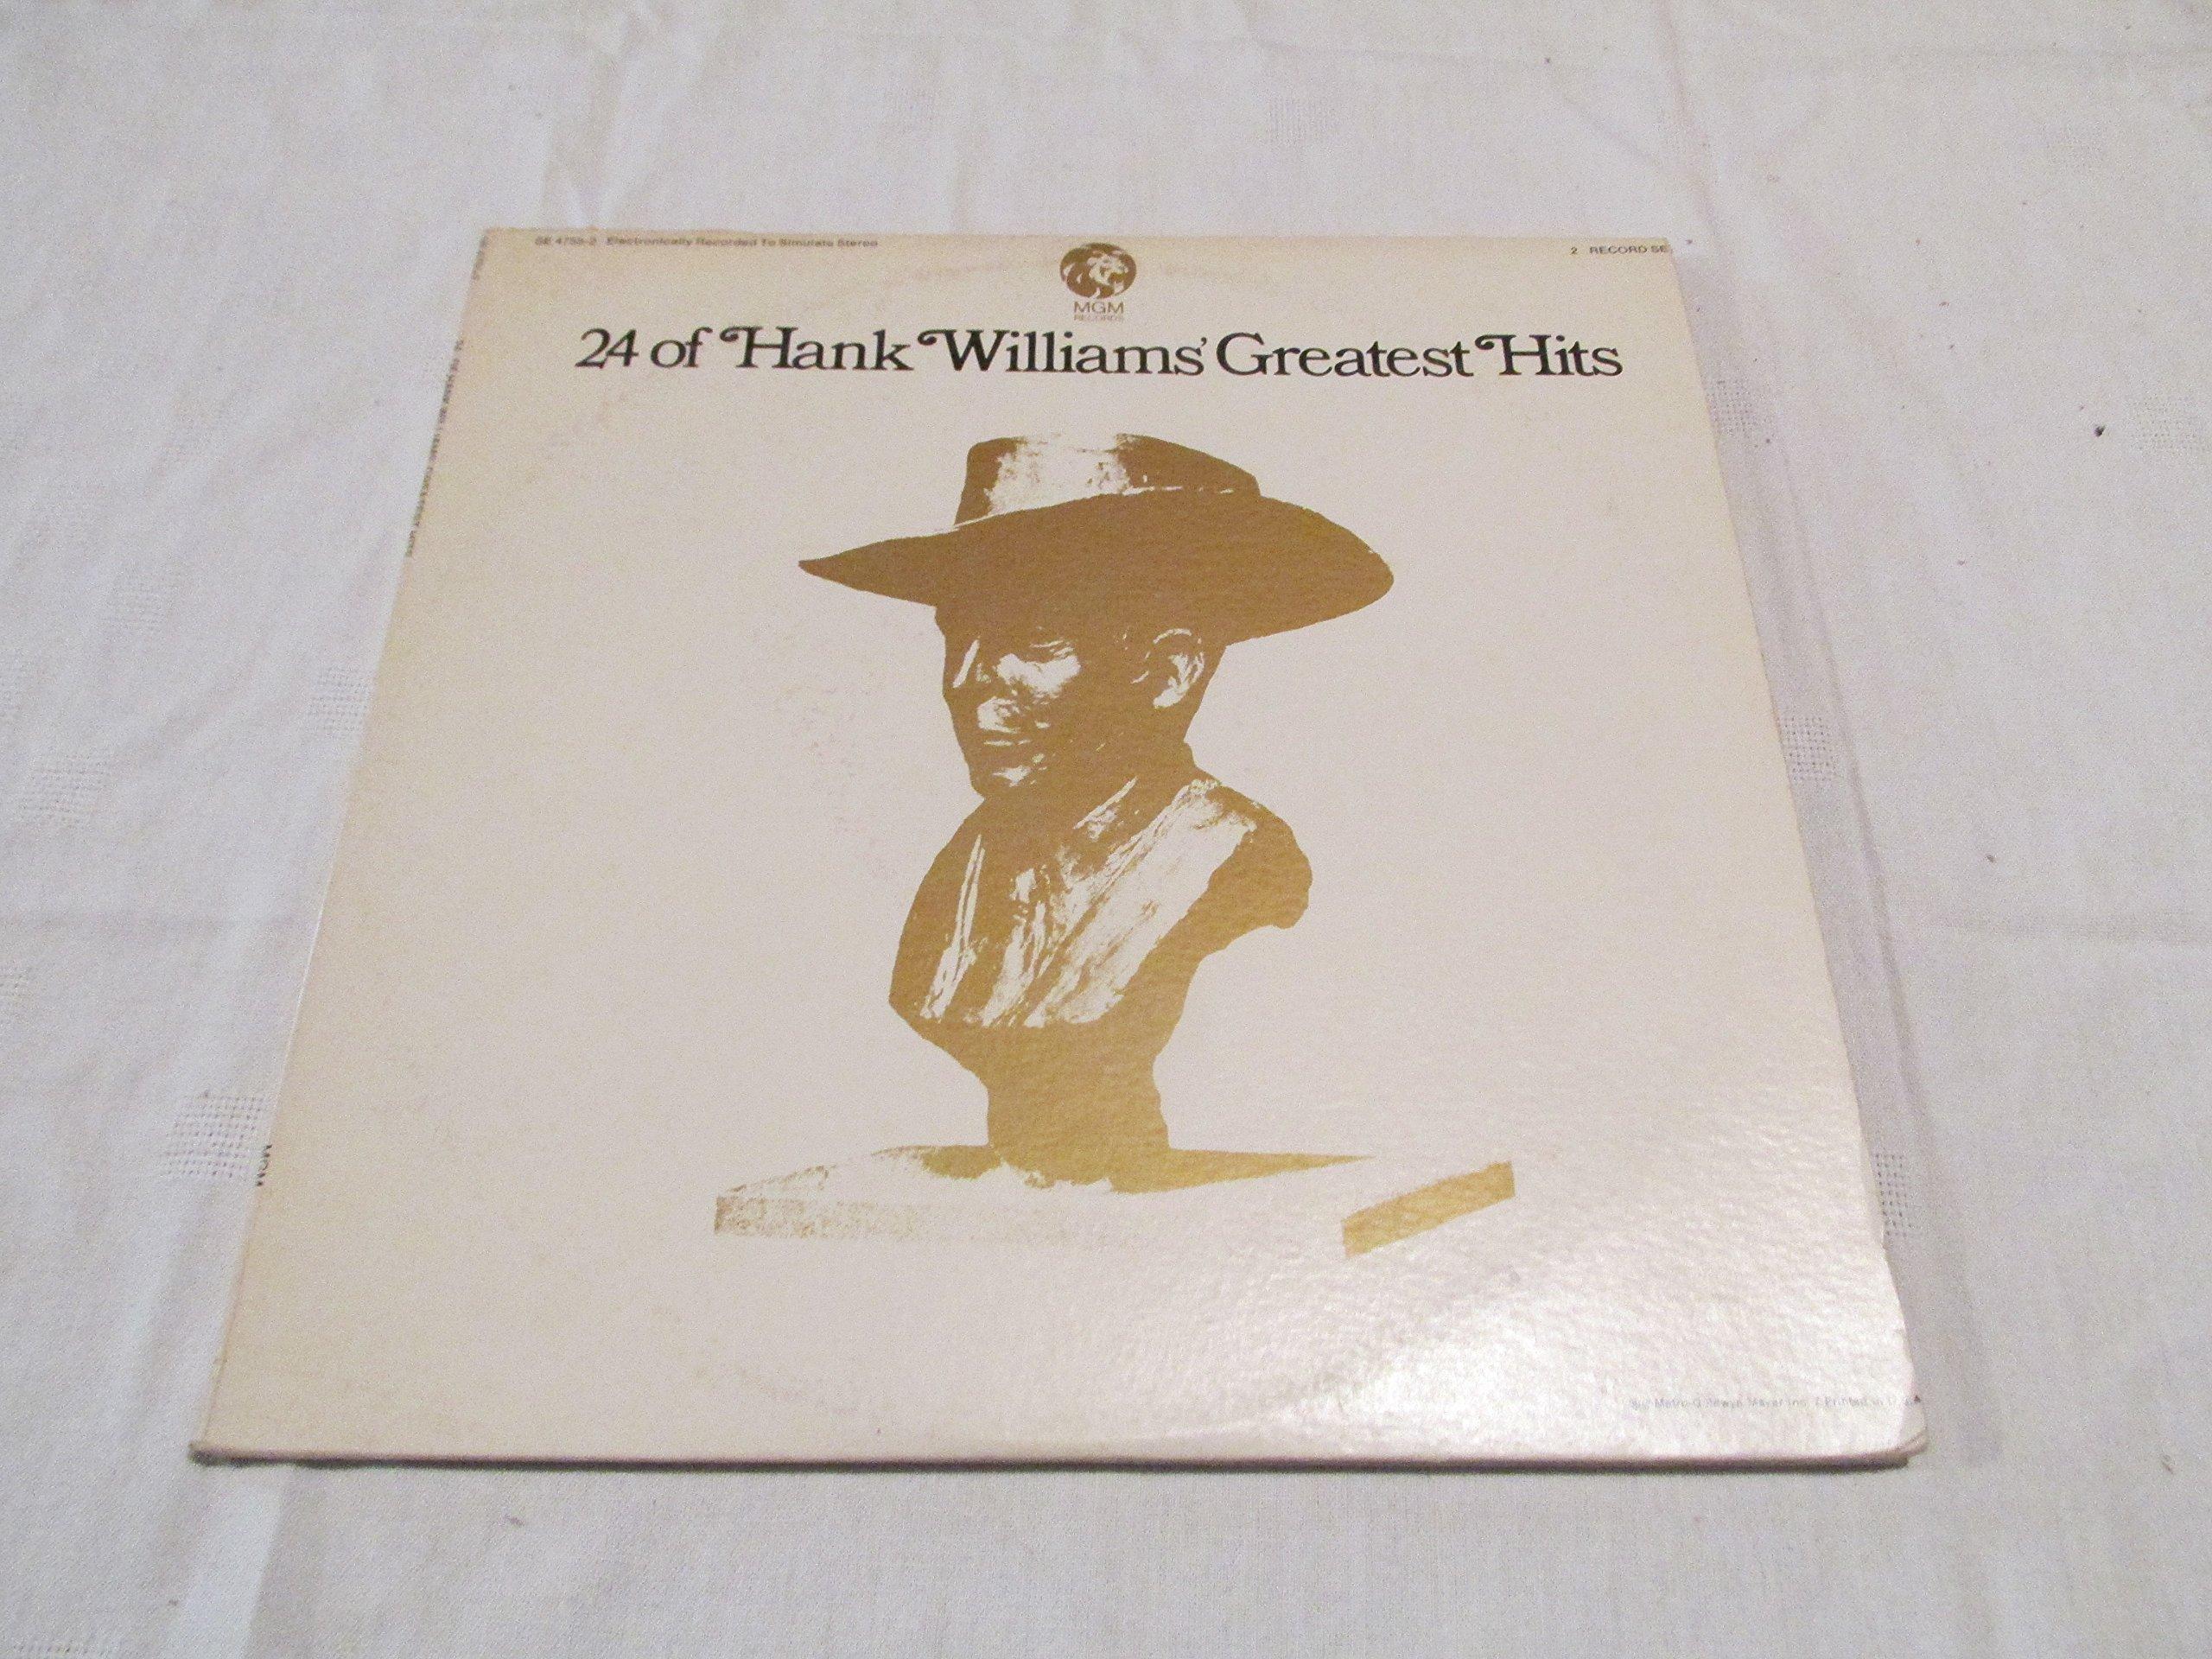 24 of Hank Williams' Greatest Hits